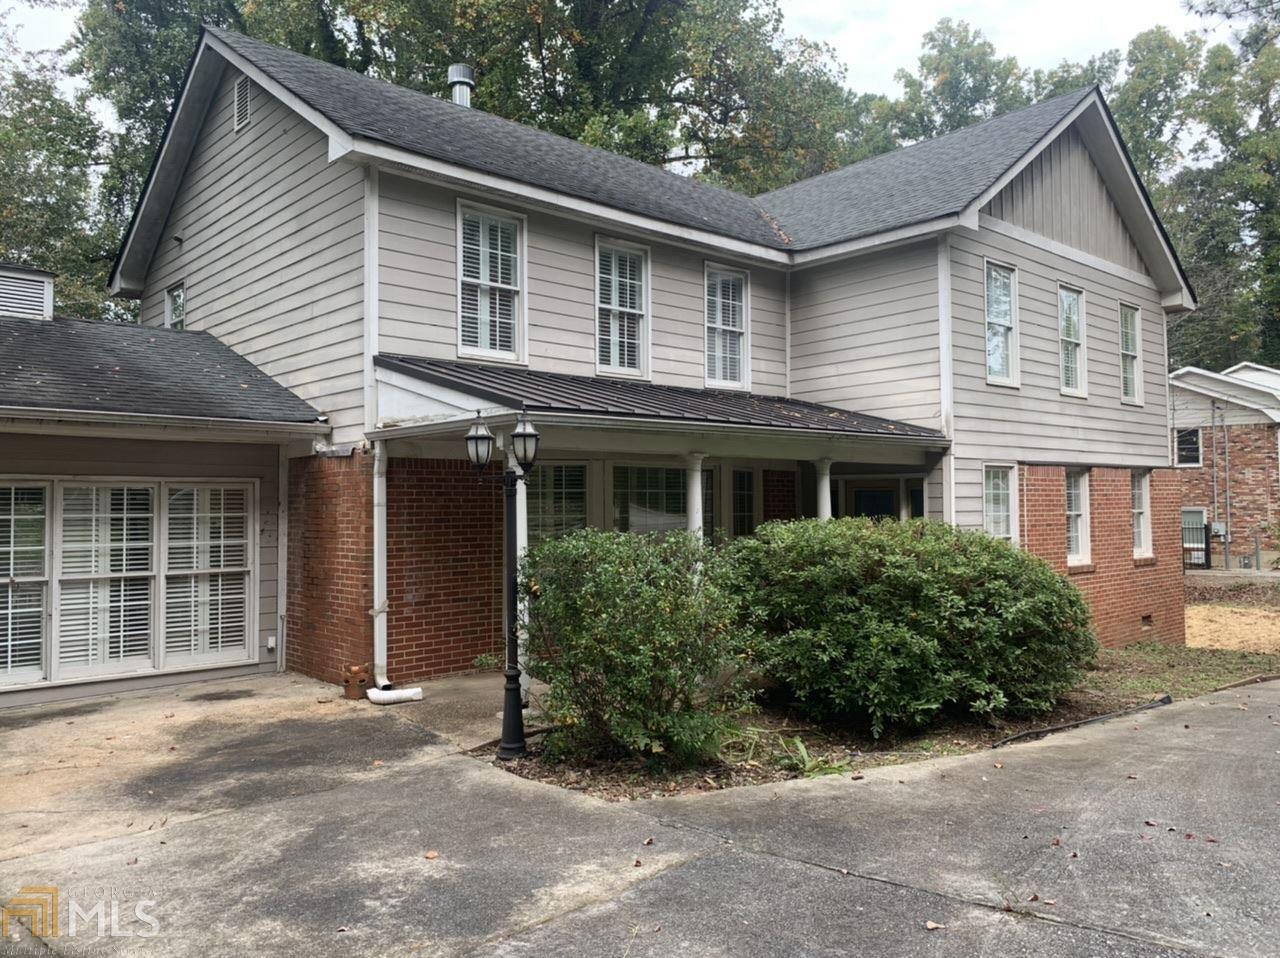 2108 Marann Dr, Atlanta, GA 30345 - MLS#: 8846849